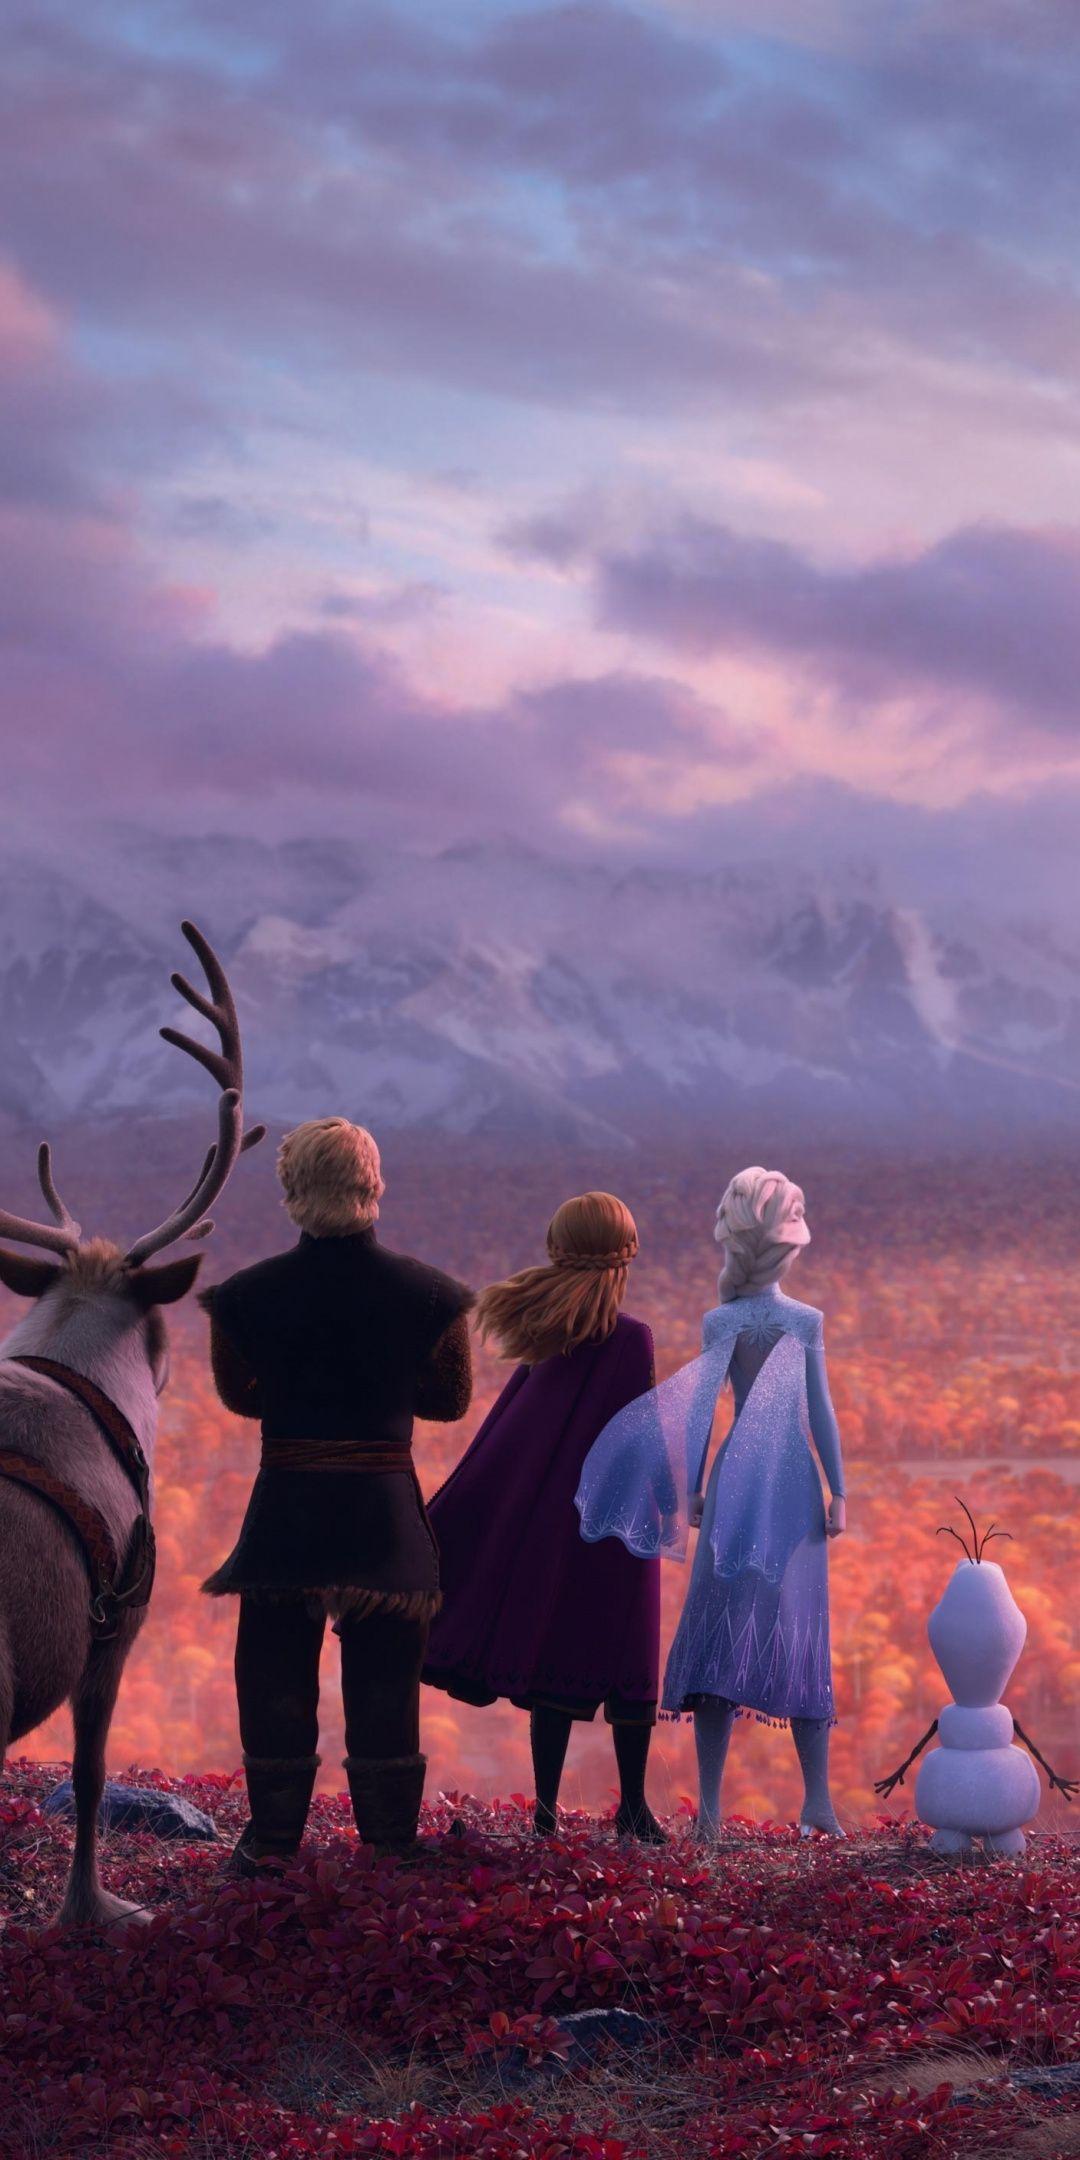 Frozen 2 Movie 1080x2160 Wallpaper Wallpaper Iphone Disney Princess Wallpaper Iphone Disney Disney Princess Wallpaper